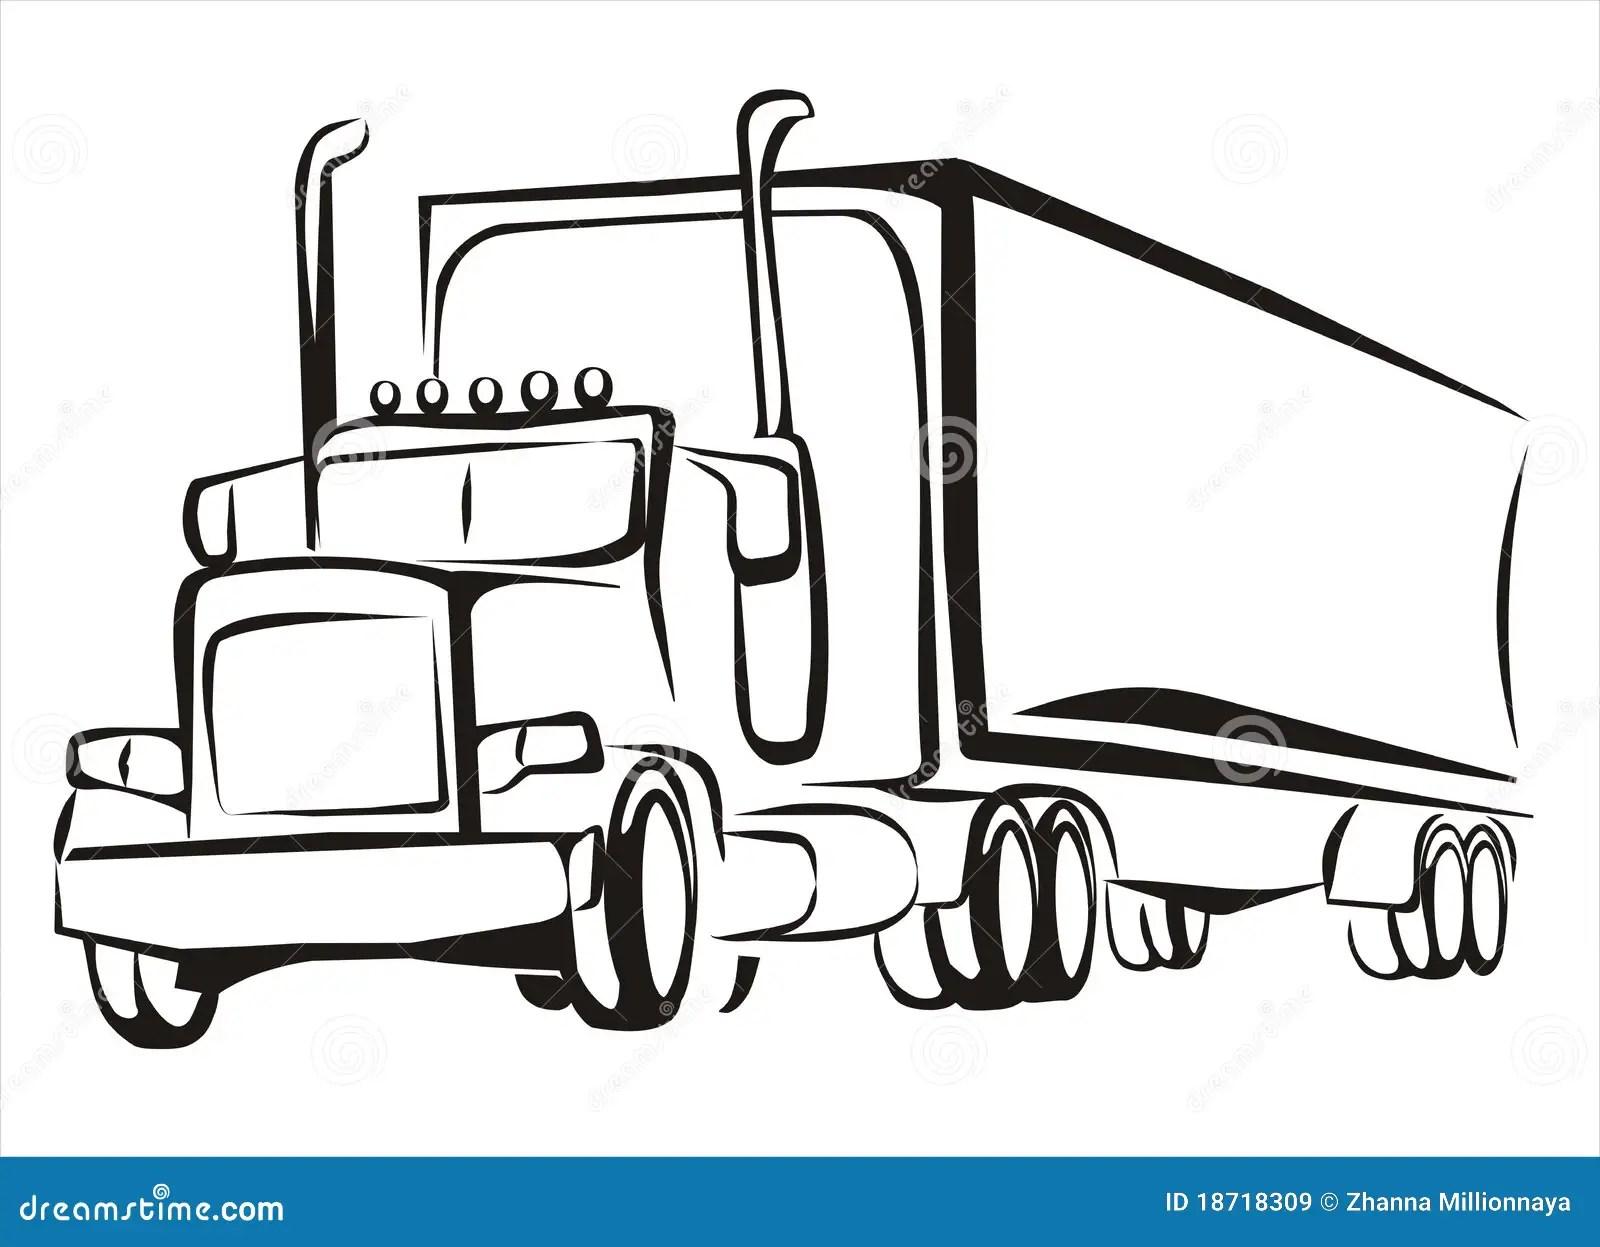 Lkw Lastwagen Iosolated Abbildung Vektor Abbildung